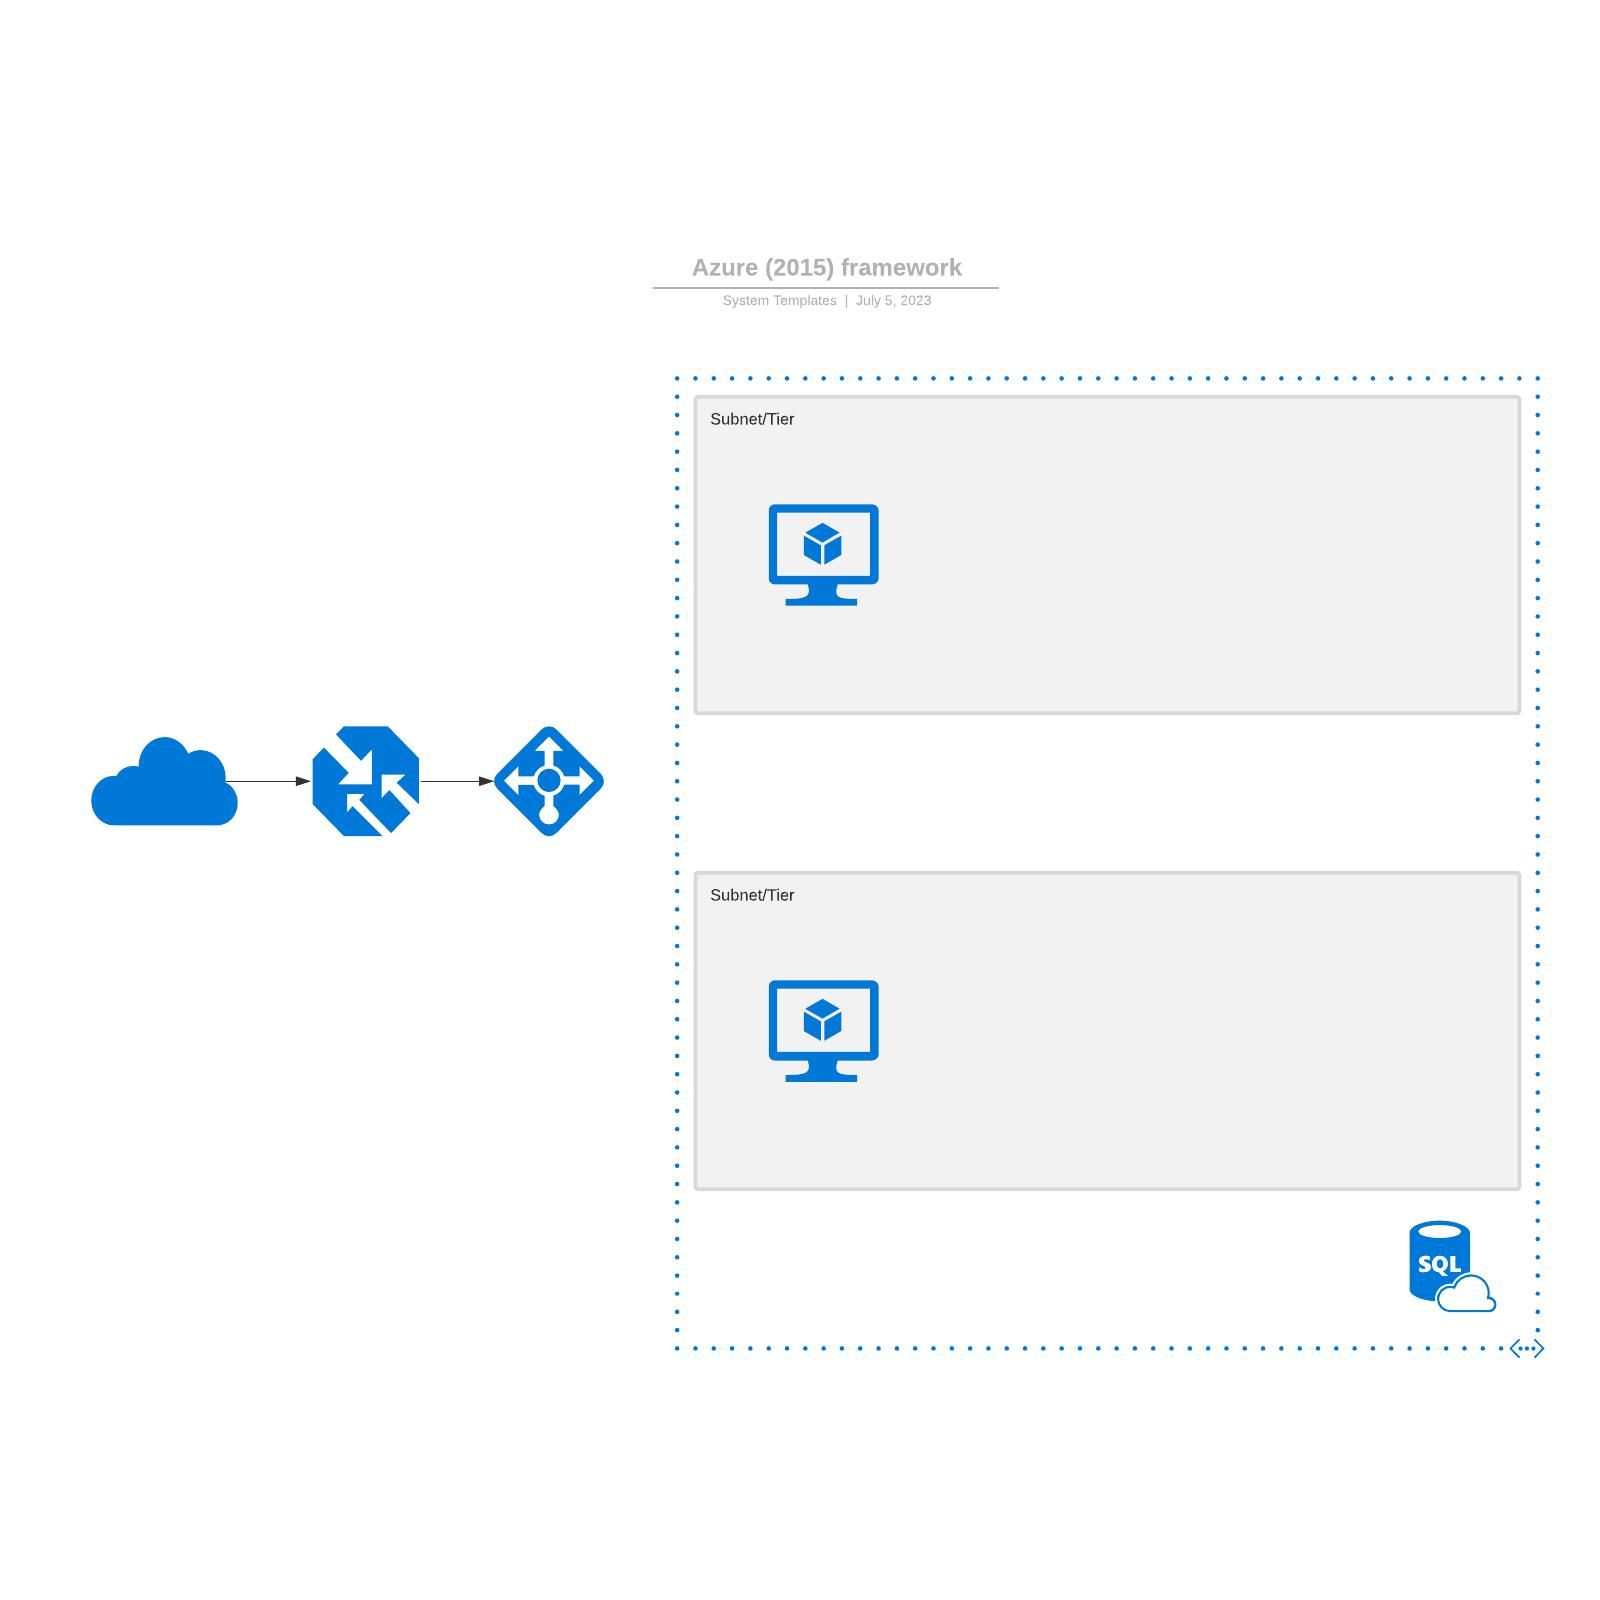 Azure (2015) framework